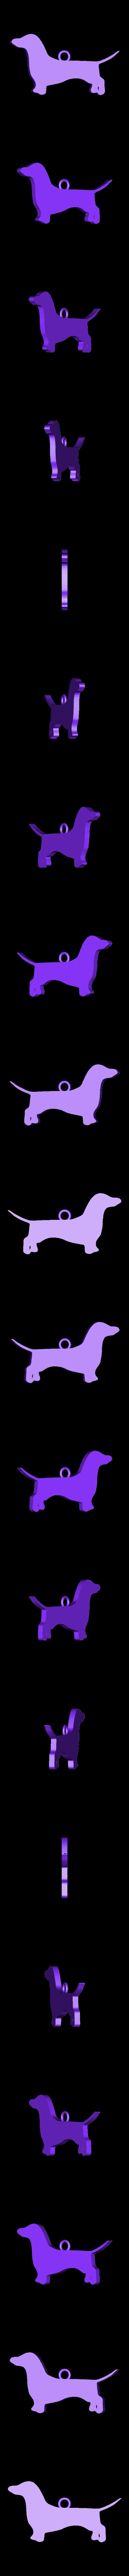 33.stl Download STL file Dogs • 3D printing object, GENNADI3313